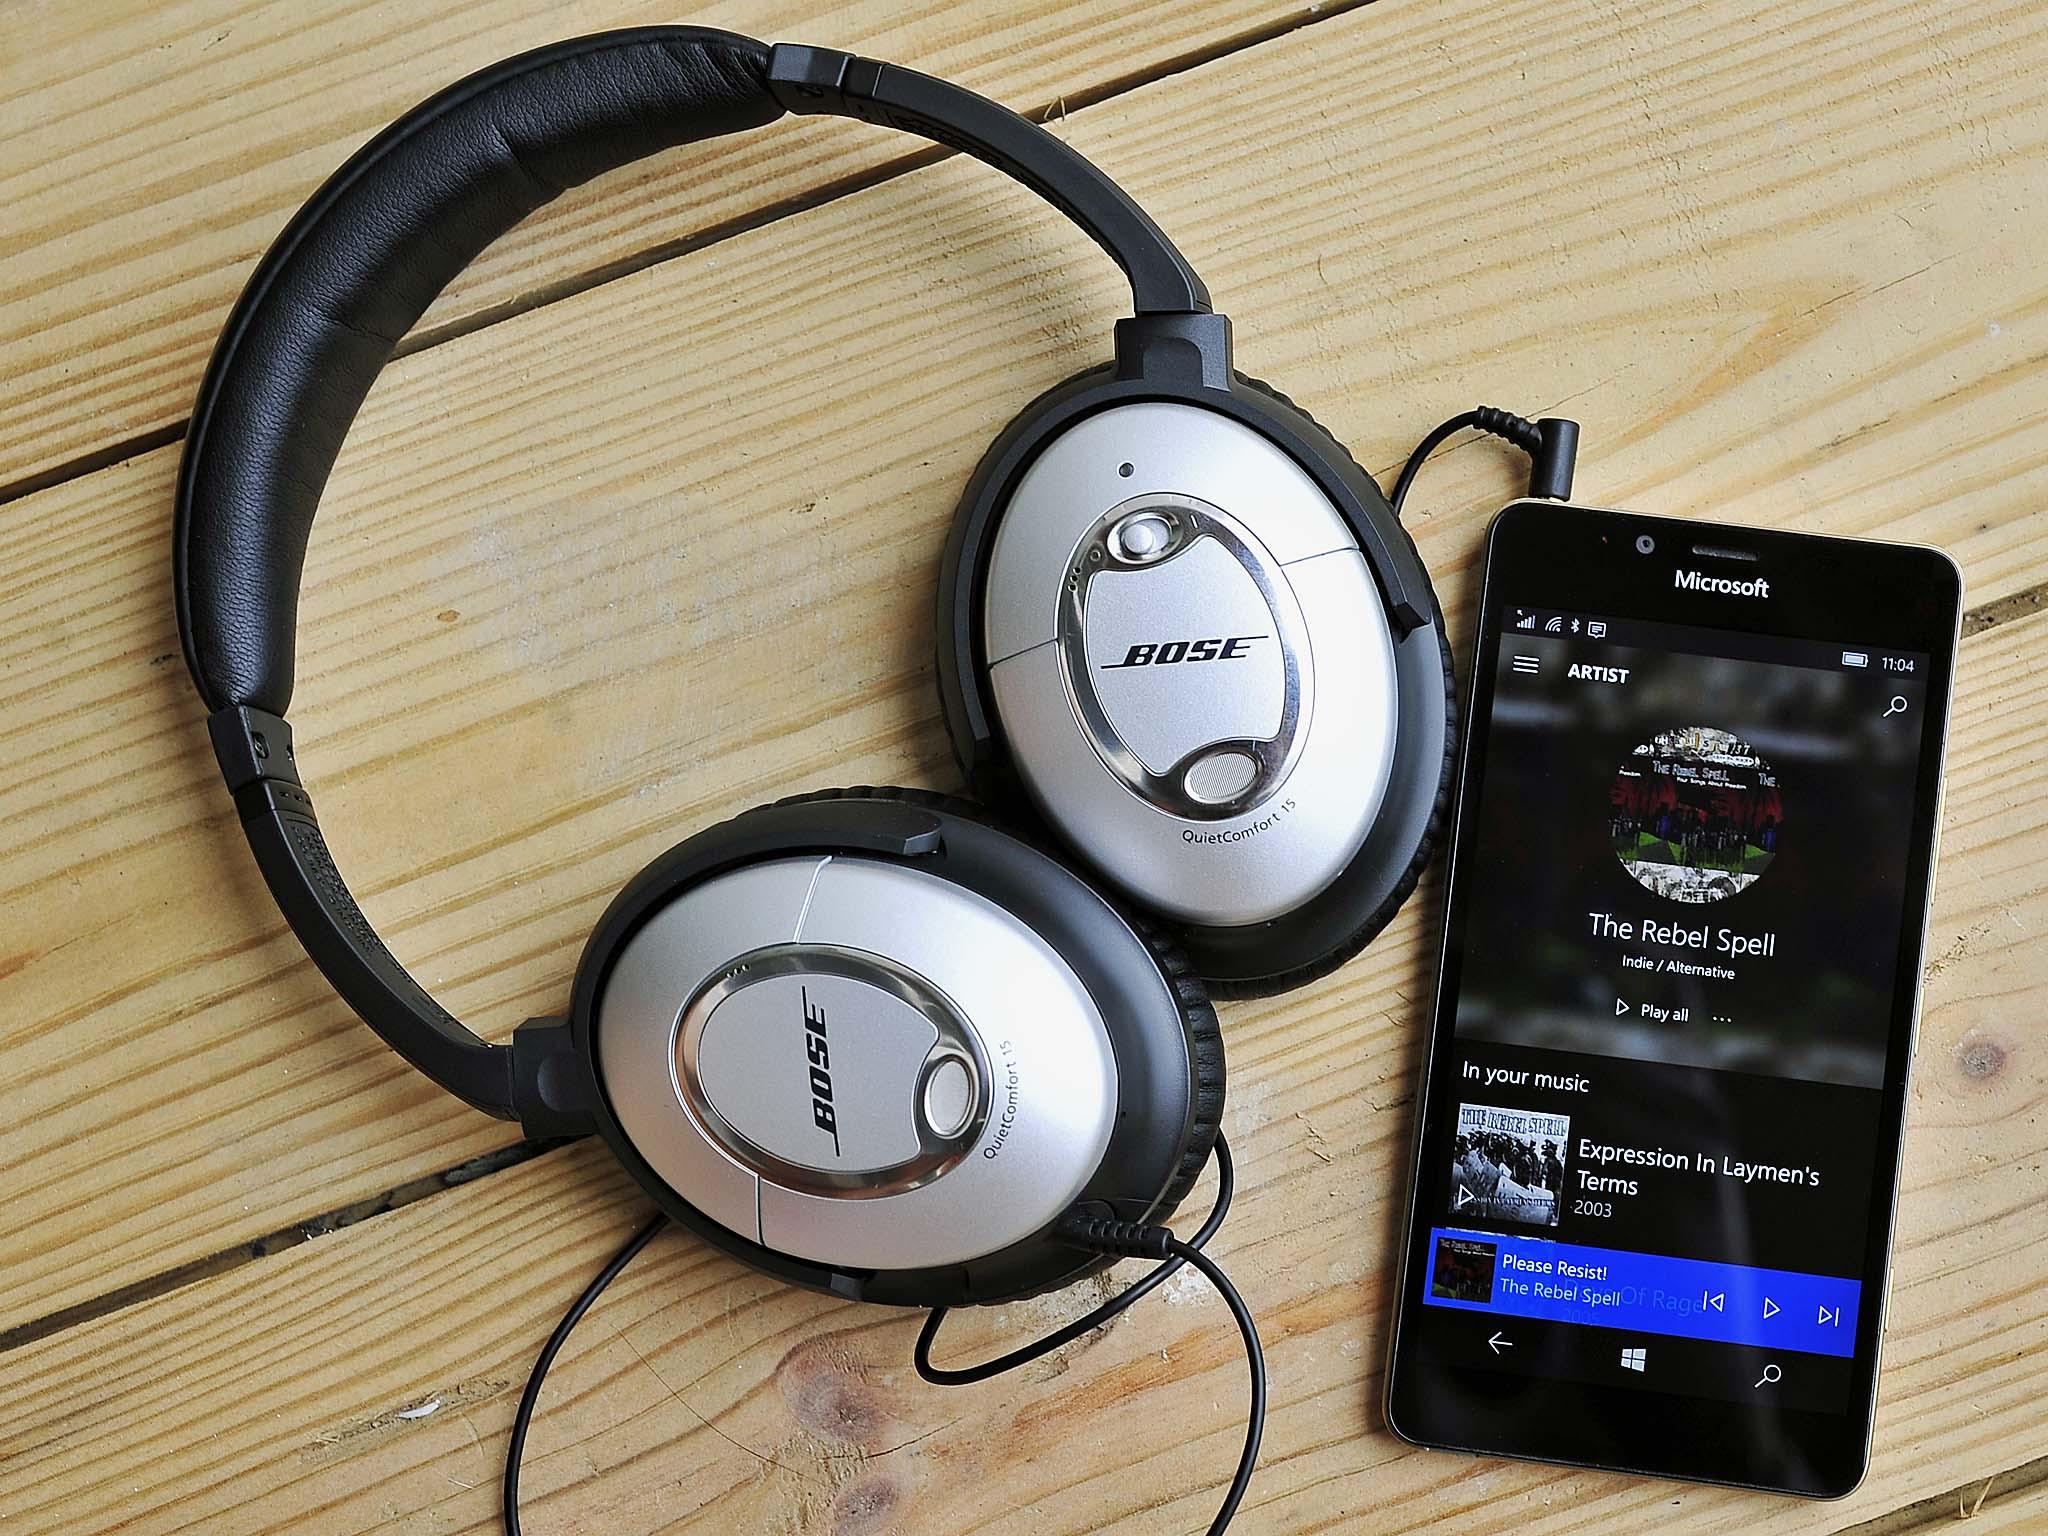 microsoft patents novel way to make headphone jacks thinner [ 1600 x 1200 Pixel ]